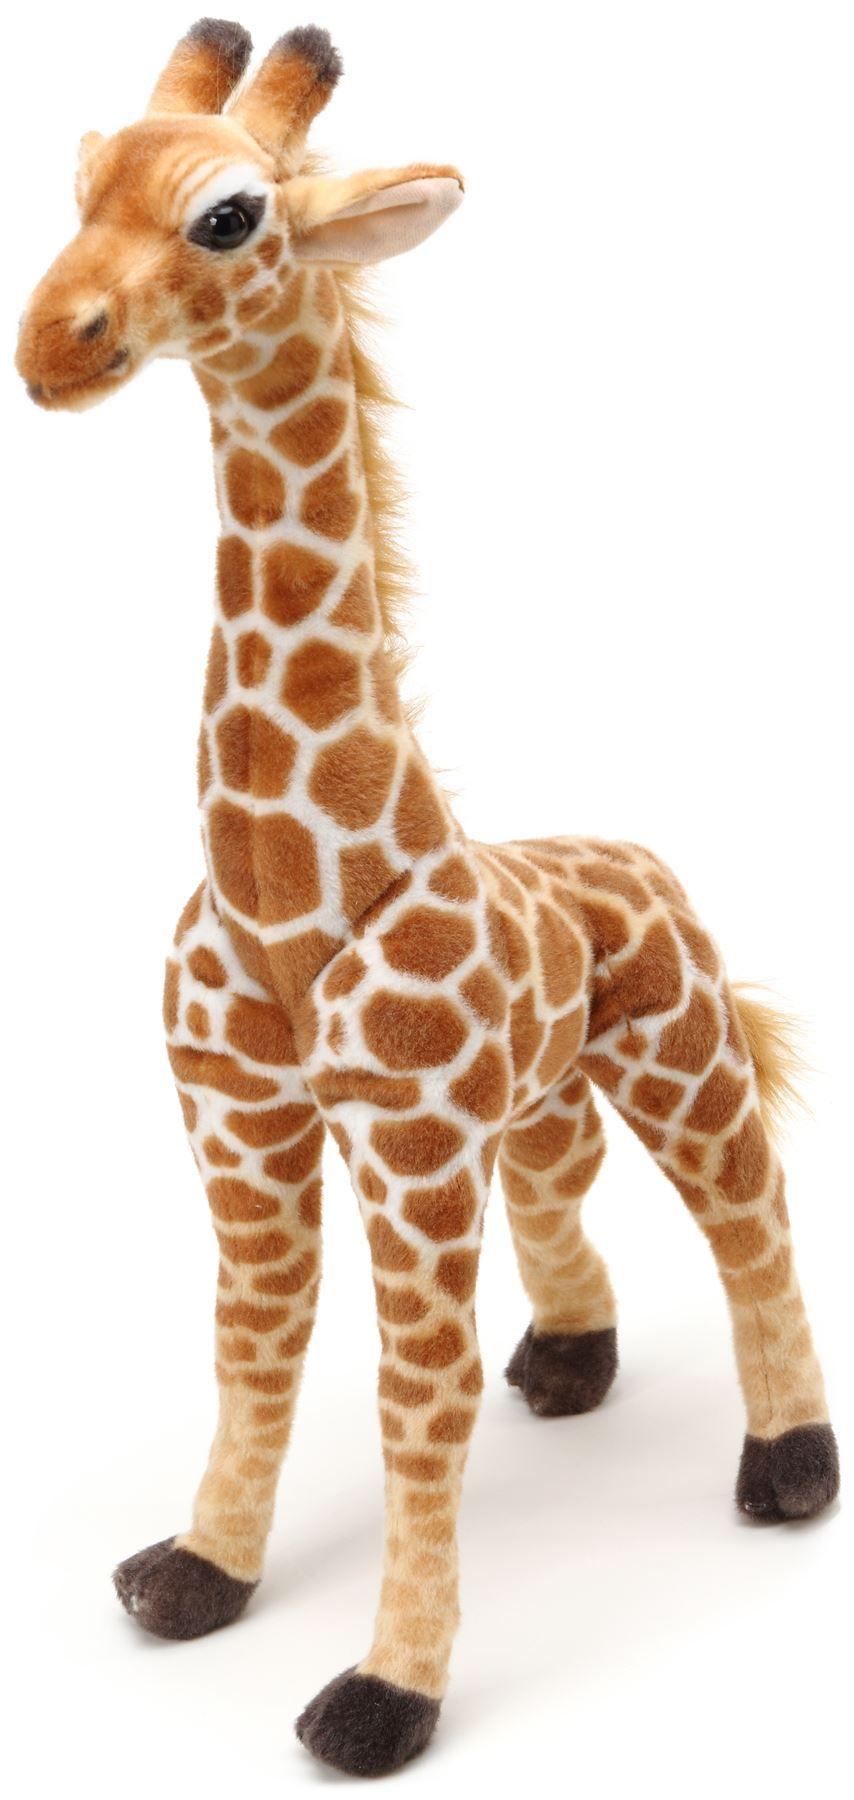 Jocelyn The Giraffe 22 Inch Tall Stuffed Animal Plush By Tiger Tale Toys Walmart Com In 2021 Giraffe Stuffed Animal Giraffe Tall Giraffe Stuffed Animal [ 1800 x 854 Pixel ]